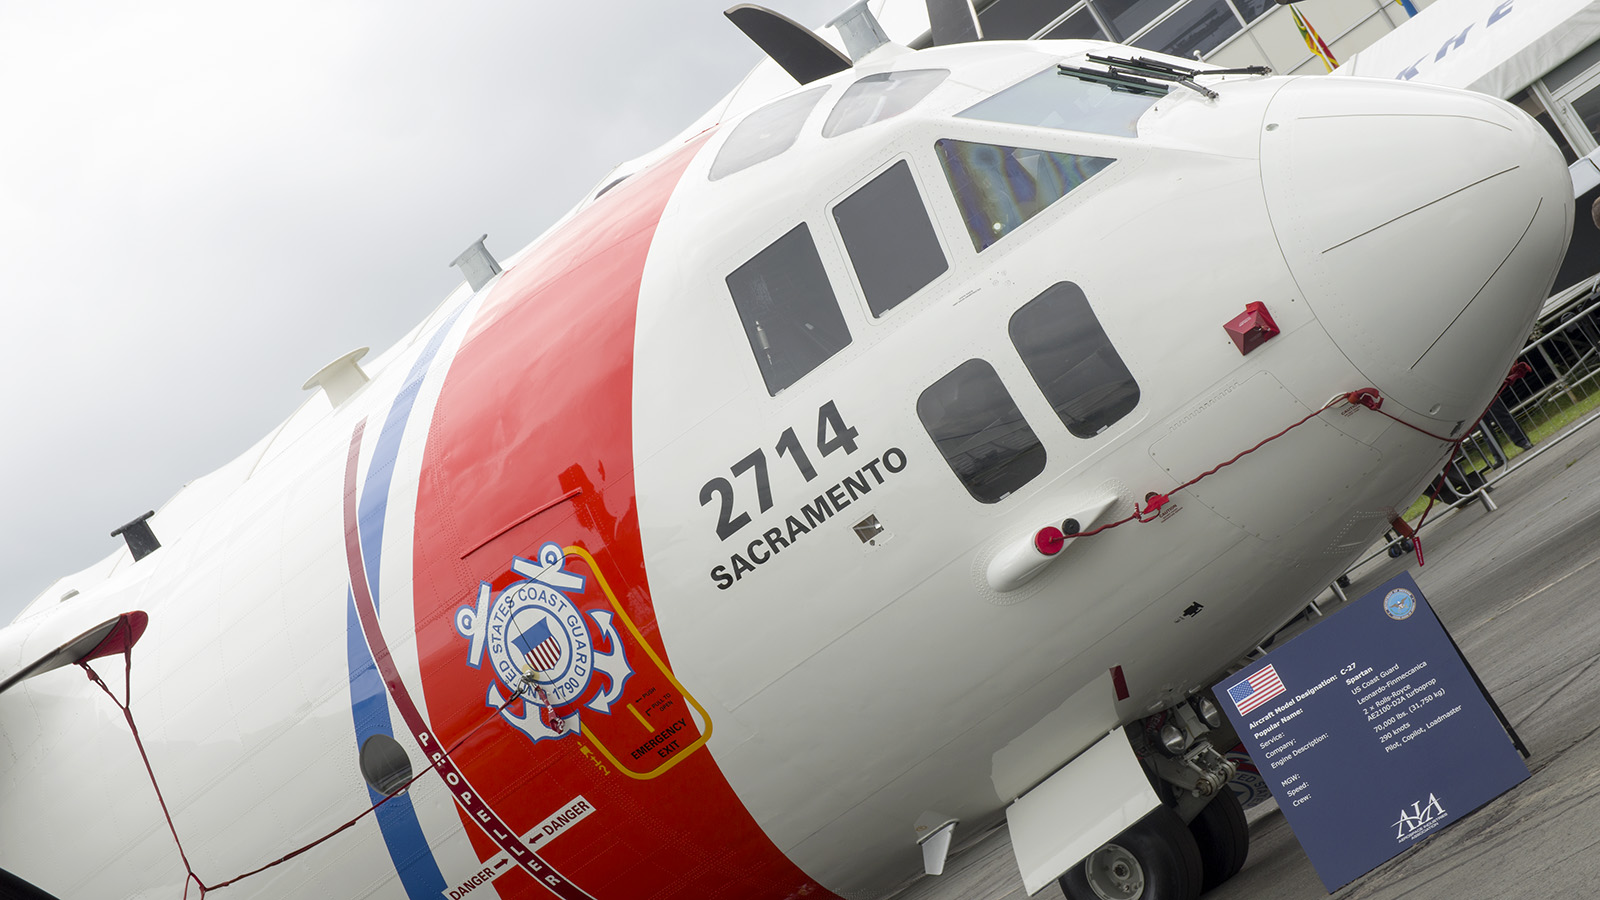 _IMG5538 Alenia HC-27J Spartan 2714 US Coast Guard s